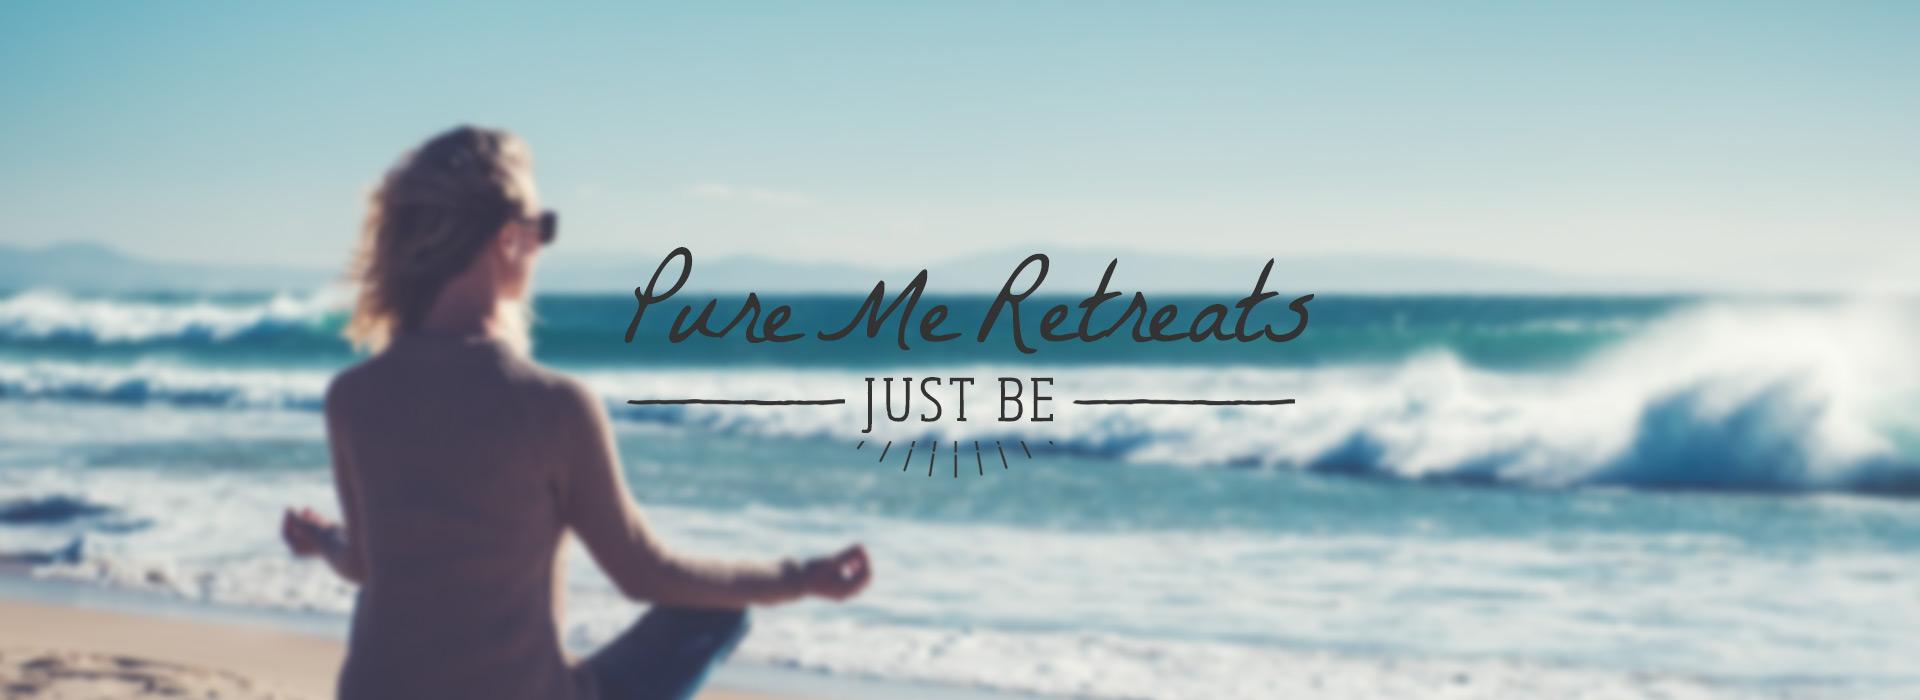 Pure-Me-Retreats-slider1